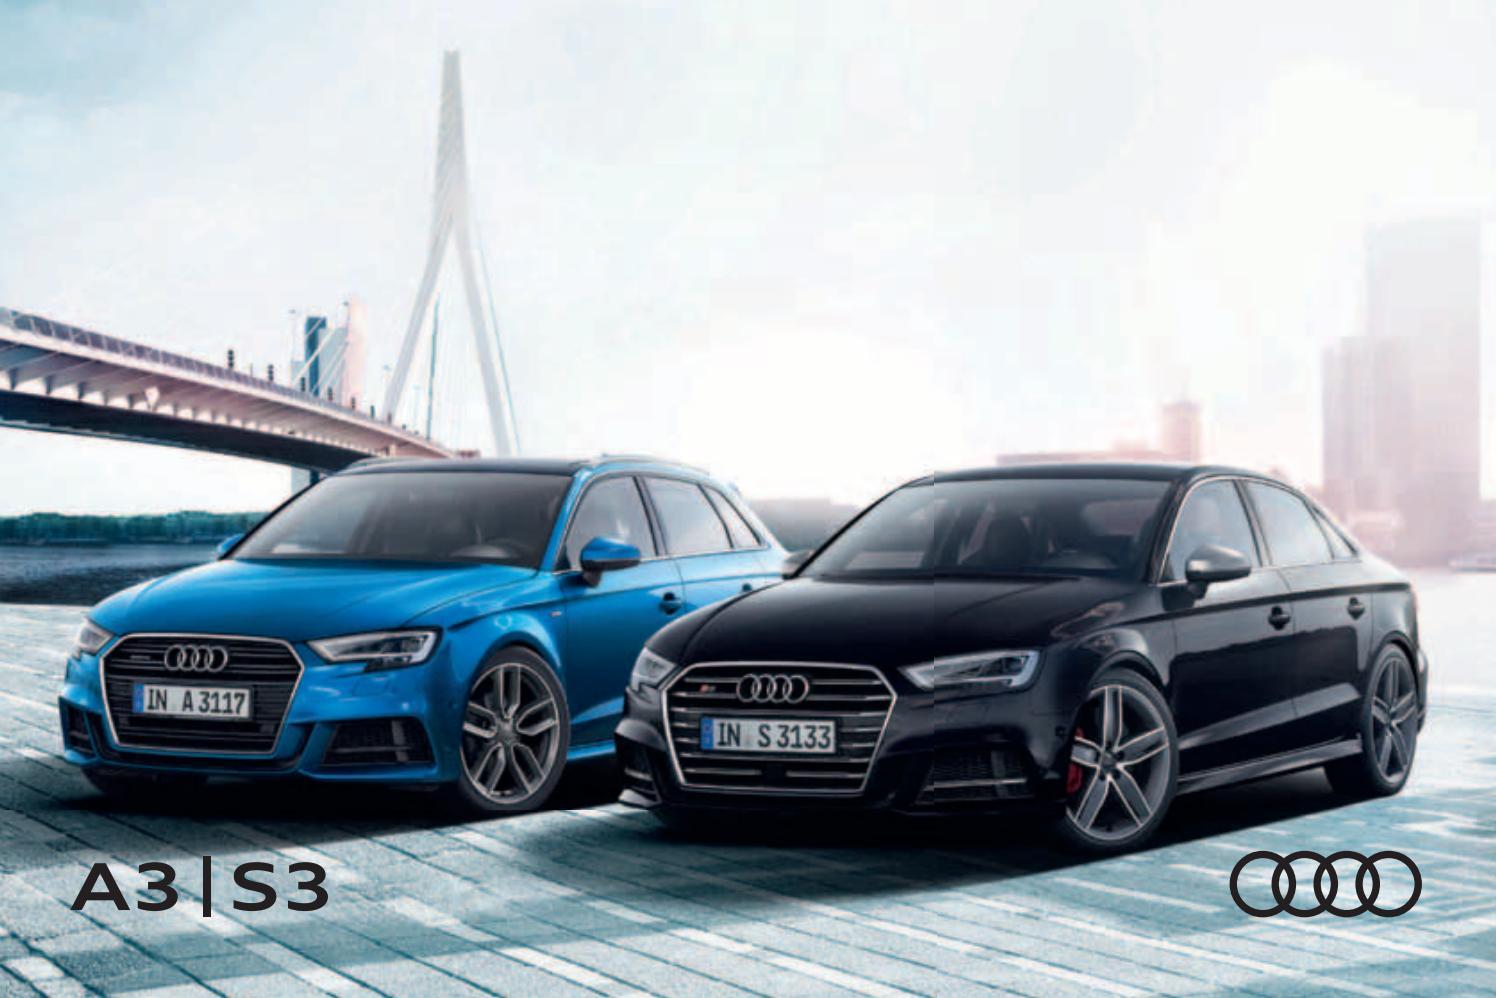 uusin uudet tyylit myymälä Audi A3 / S3 -esite 11/2018 by Avidly Agency - issuu